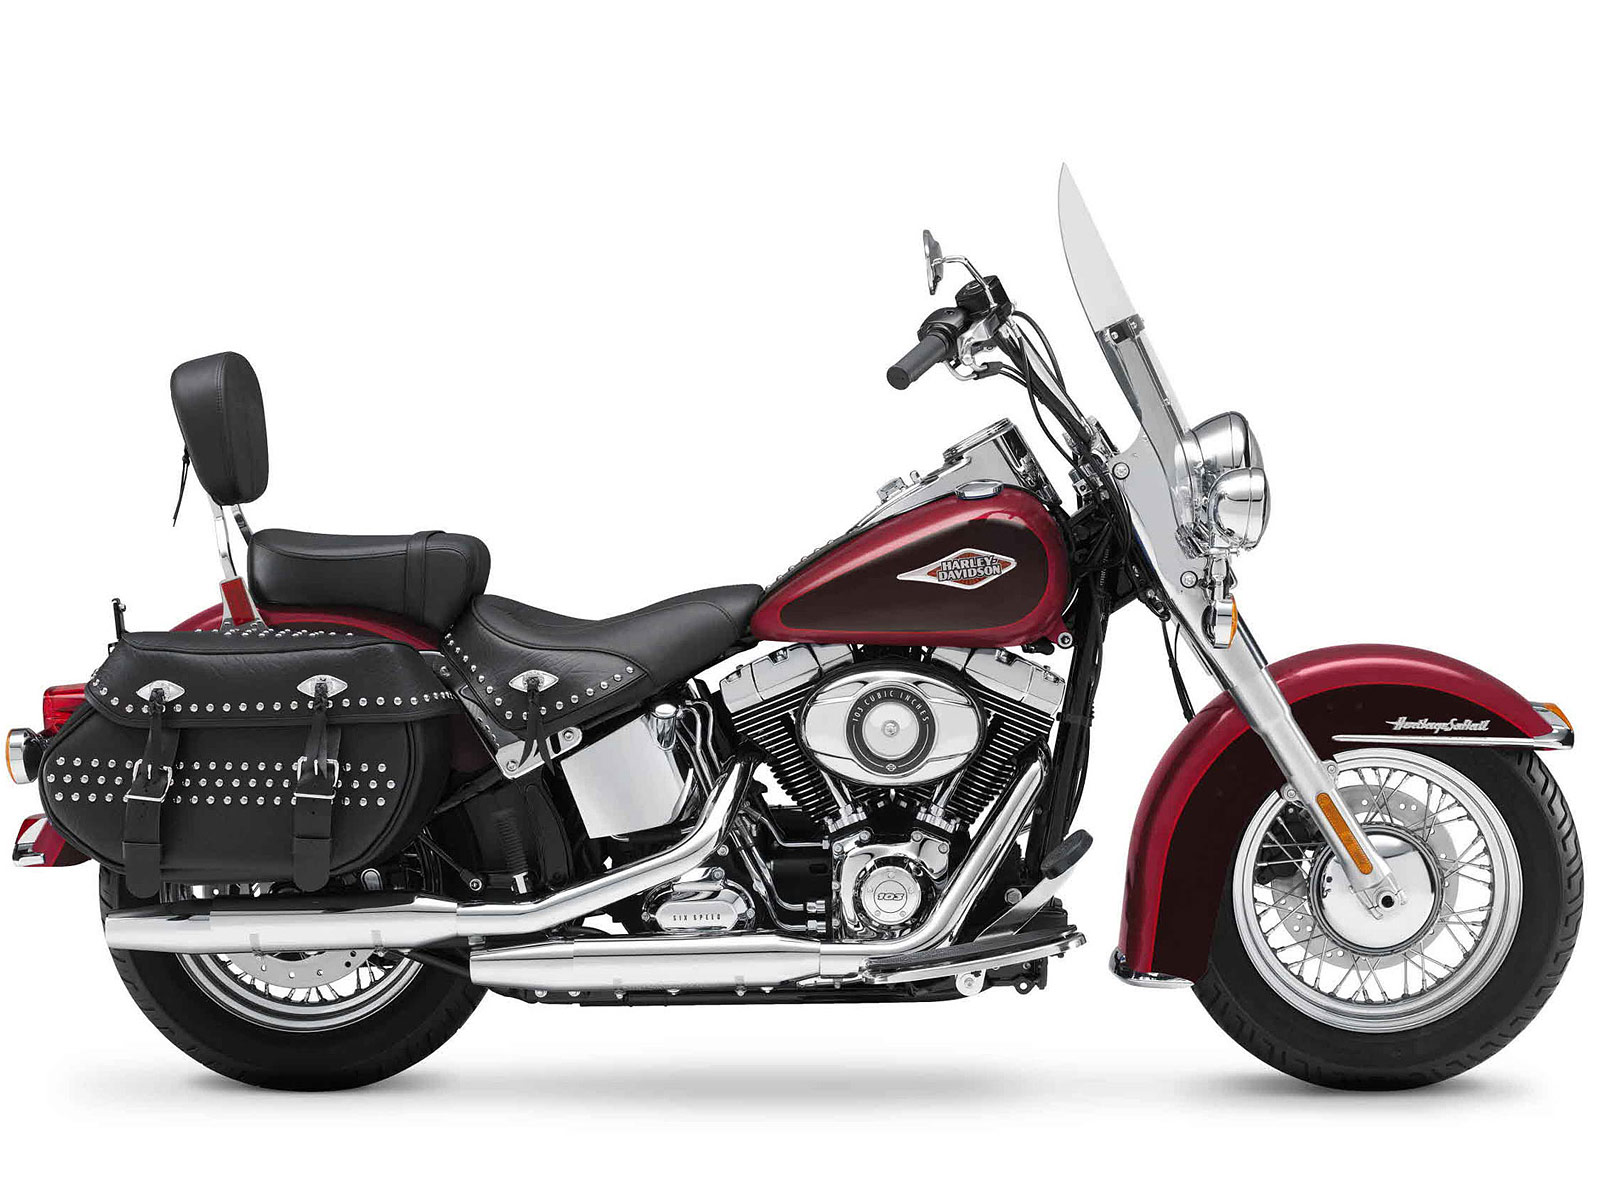 Harley Davidson Softail: 2012 FLSTC Heritage Softail Classic Harley-Davidson Pictures